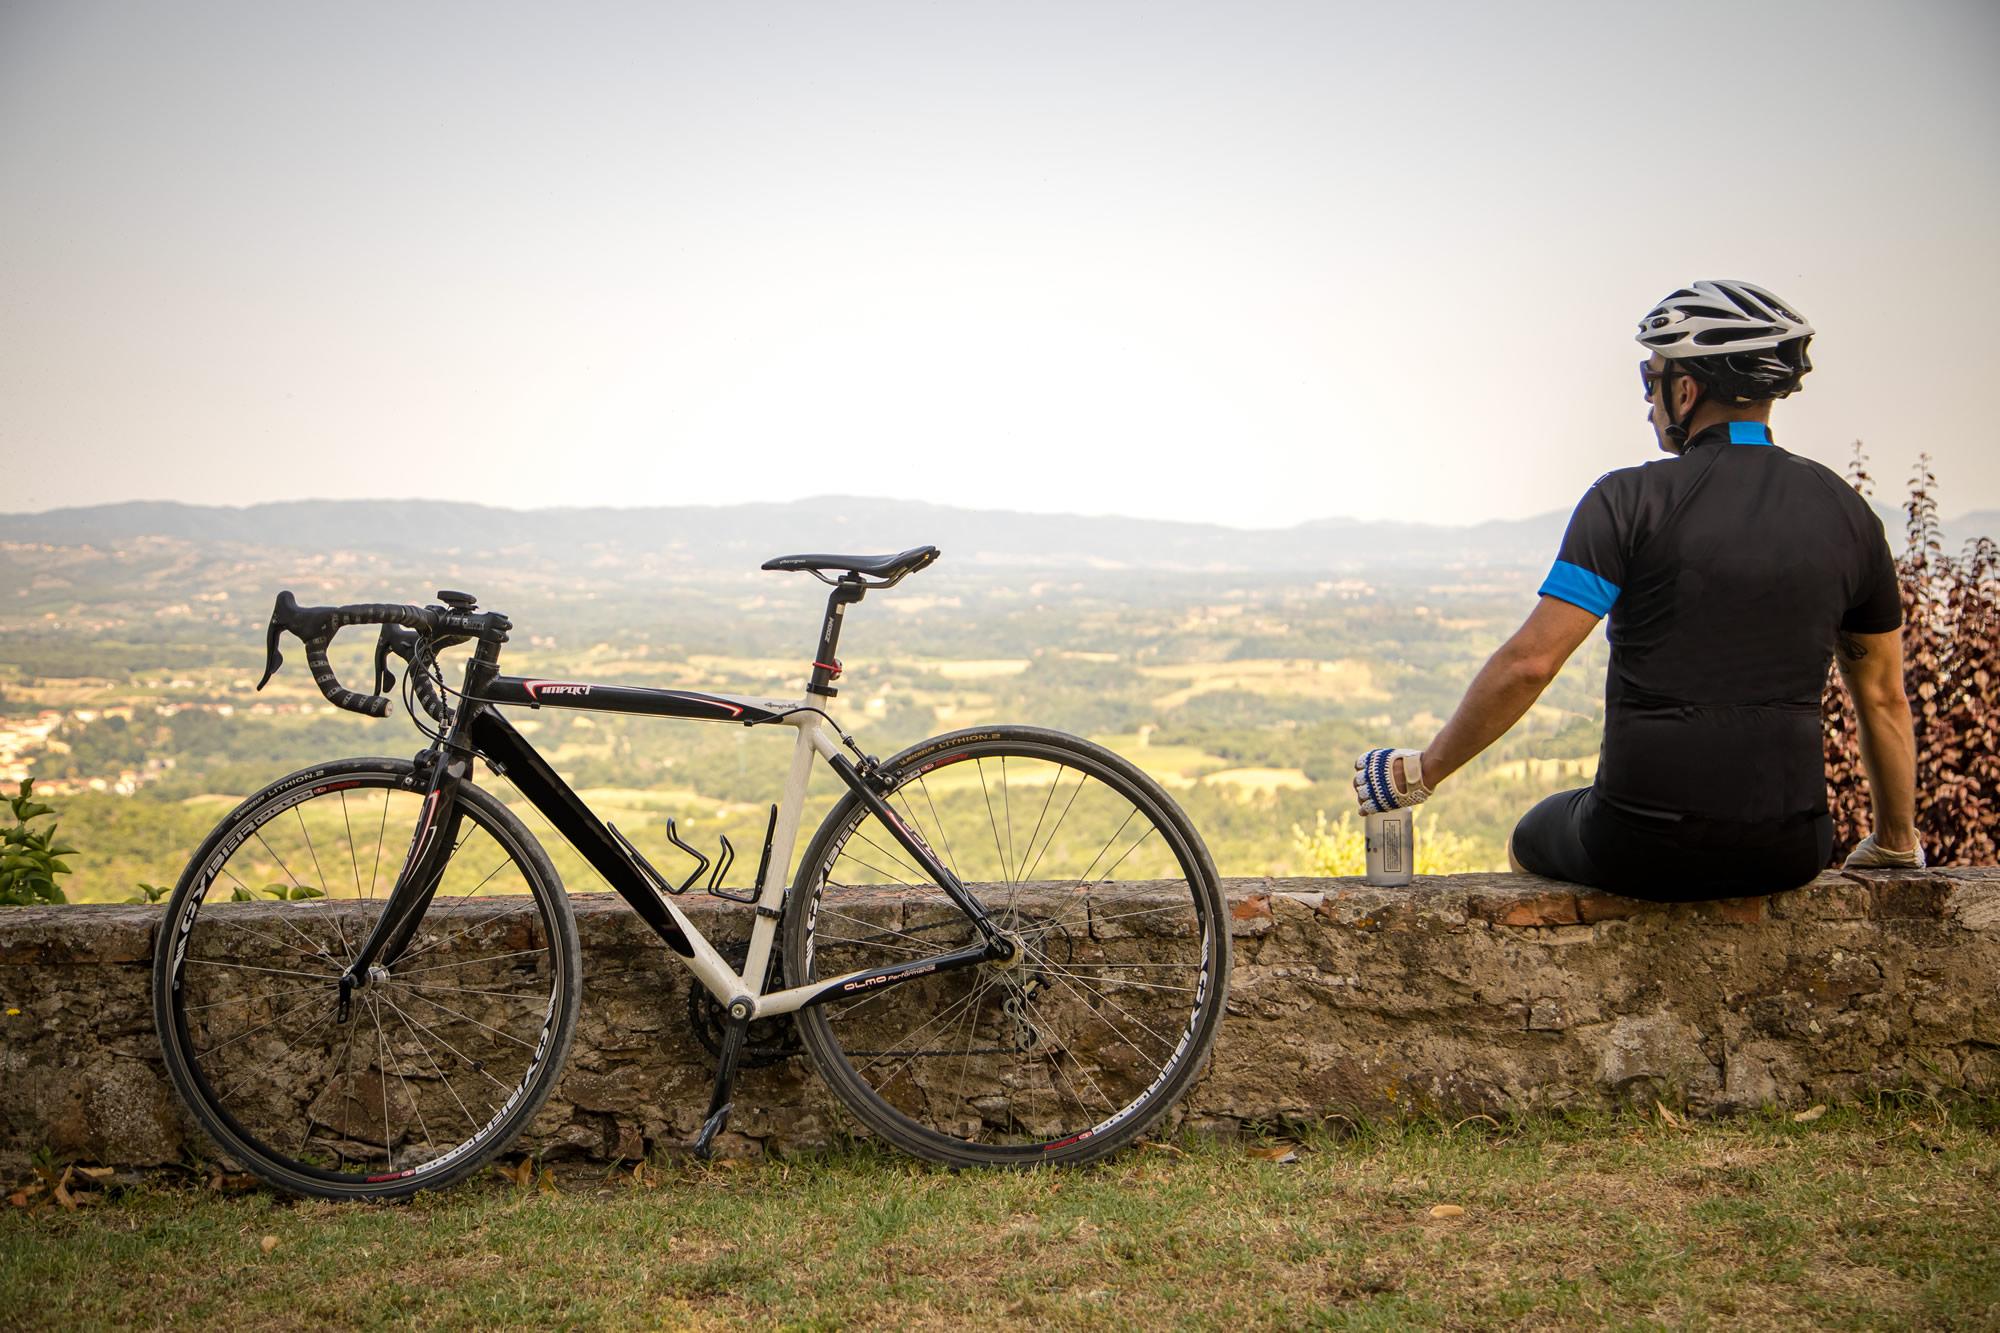 montozzi_cicloturismo-in-toscana-valdarno-bike-road